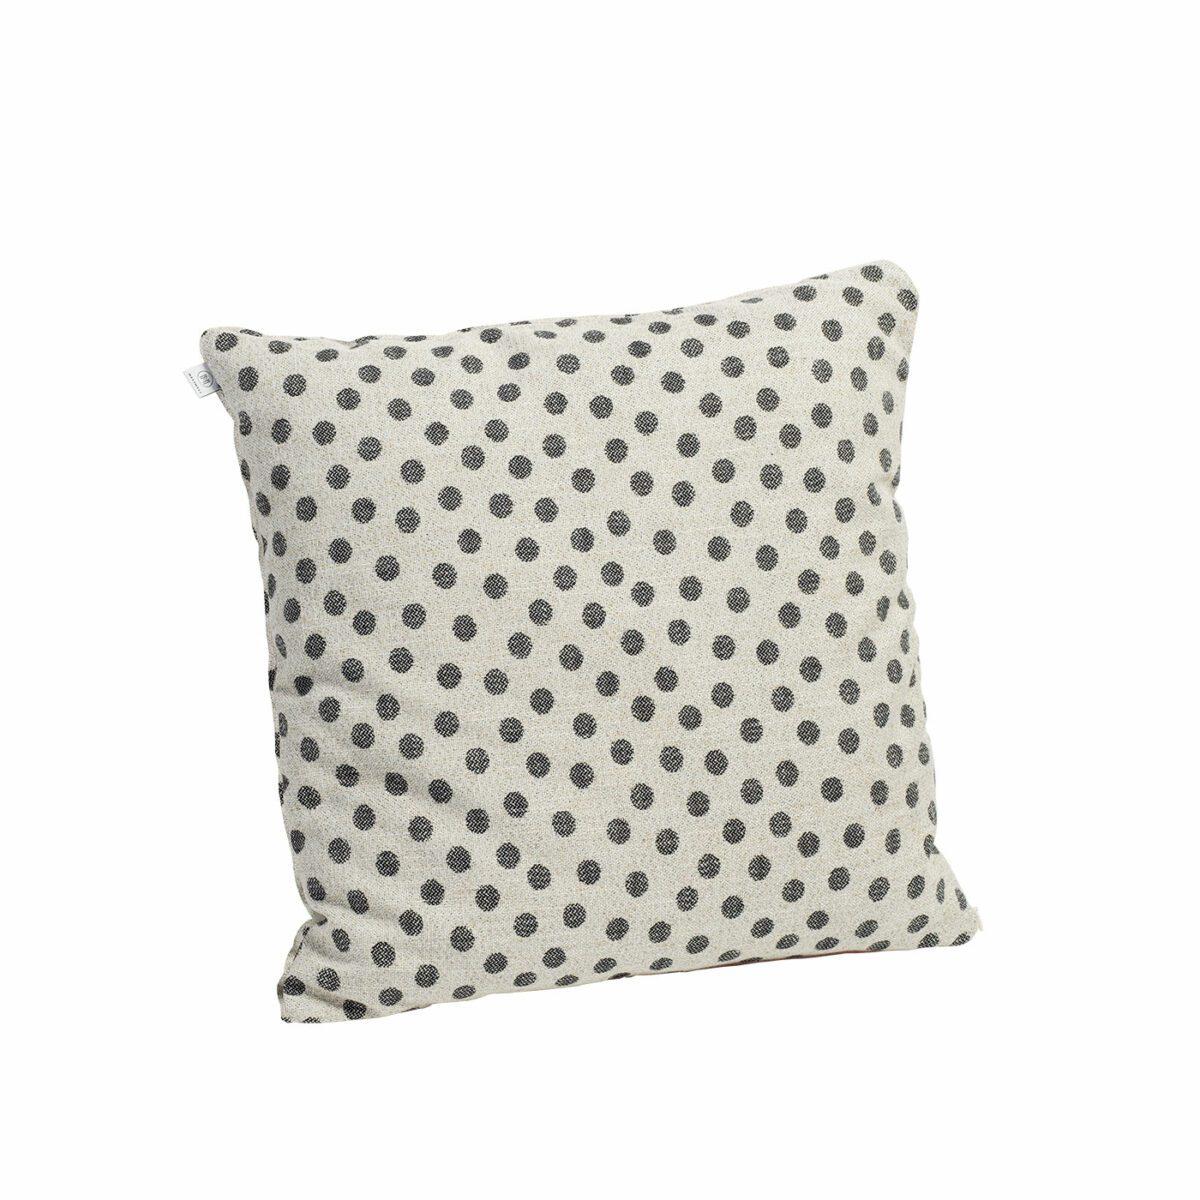 Melimeli Dot Cushion 50x50 cm